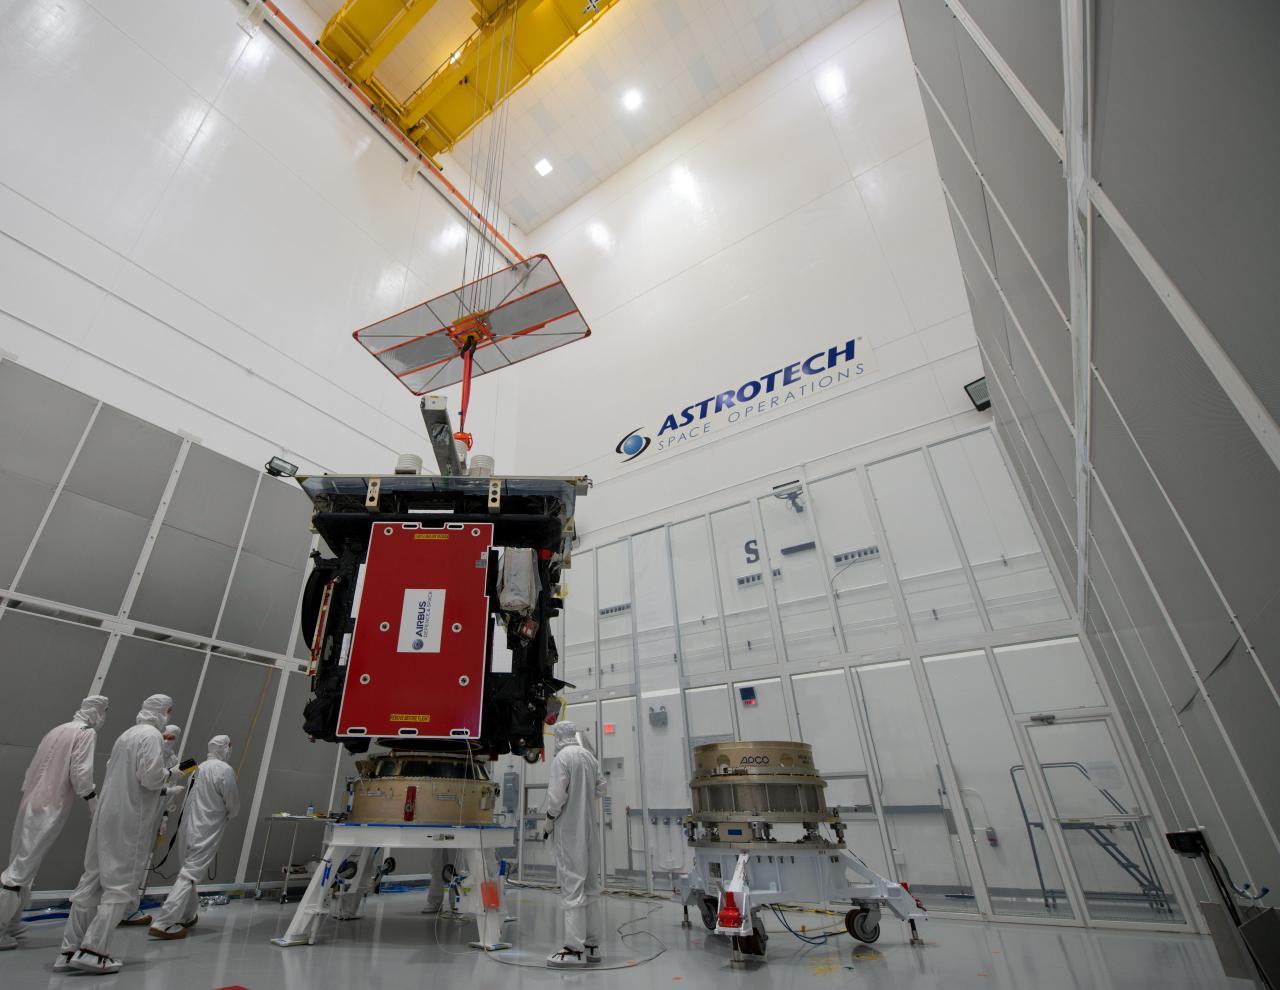 Solar_Orbiter_during_launch_preparations_3_1280.jpg